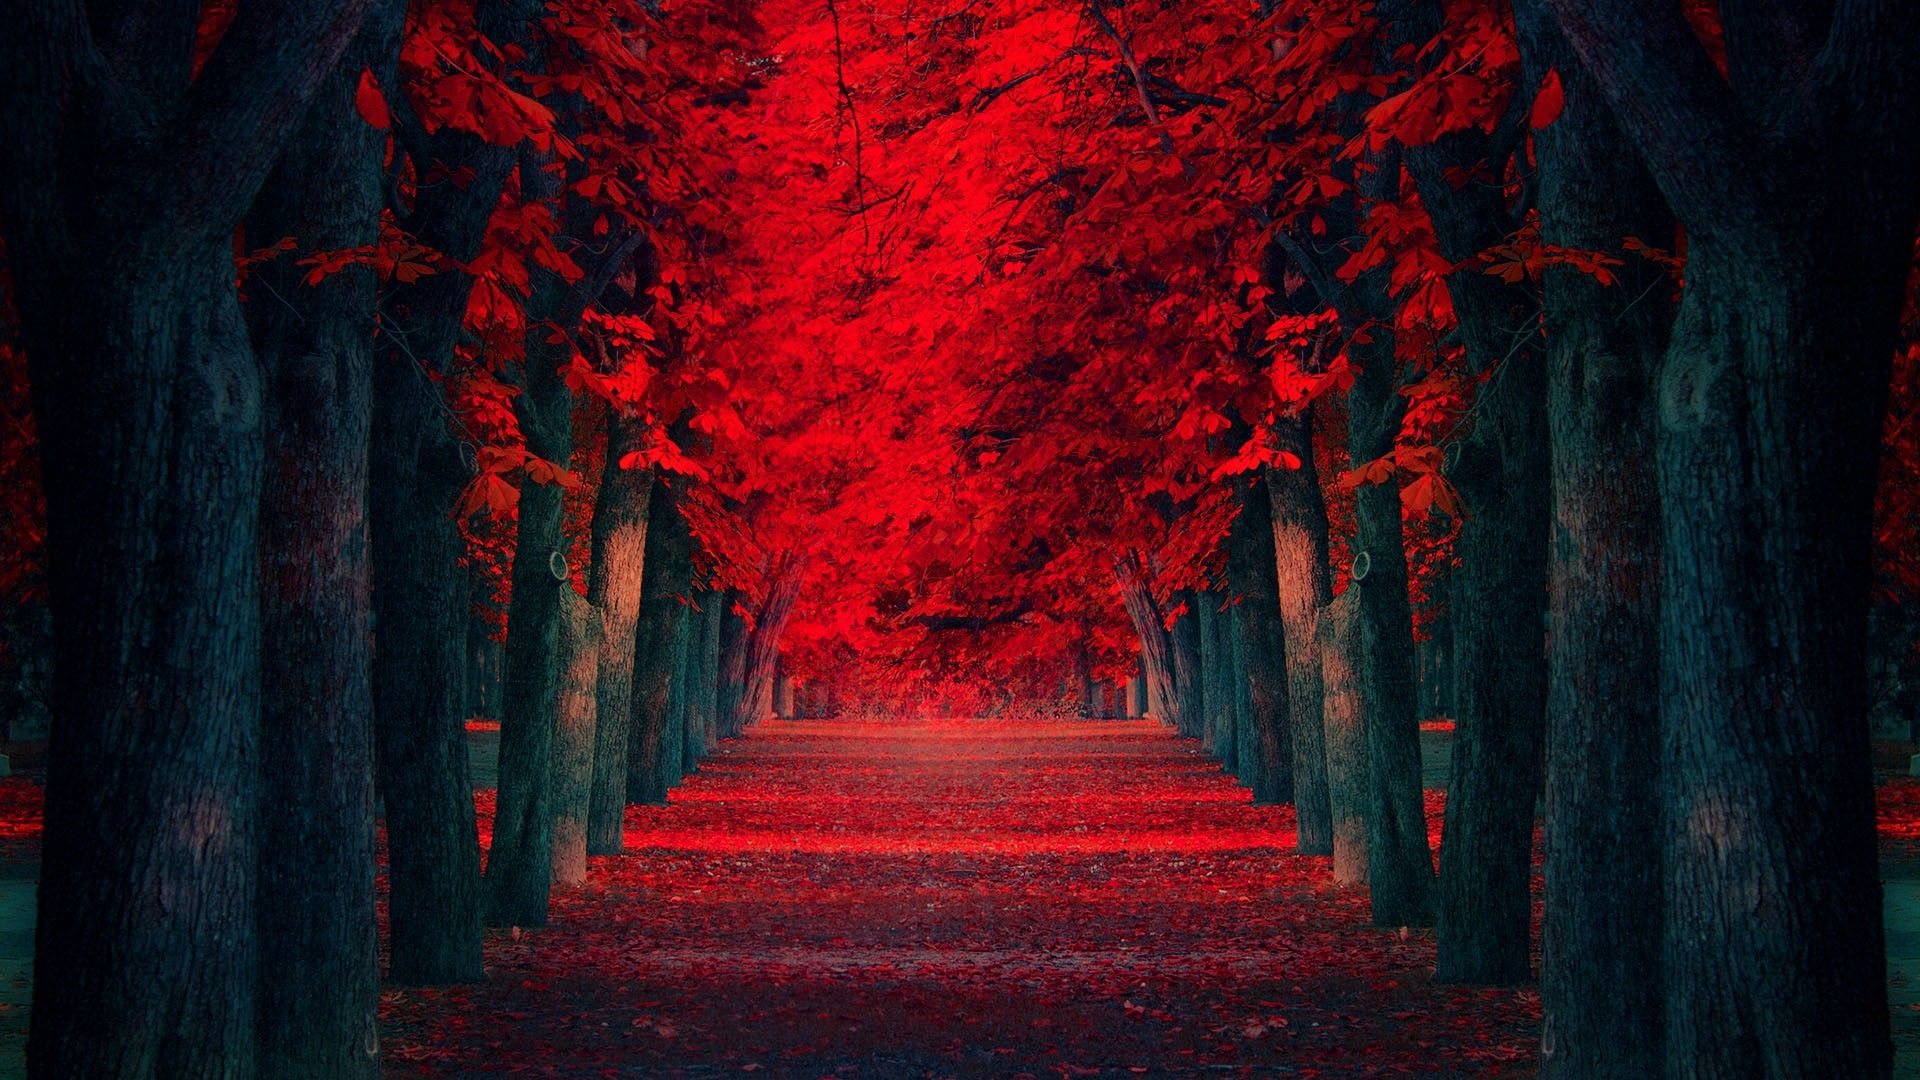 estrange_reality_redfall